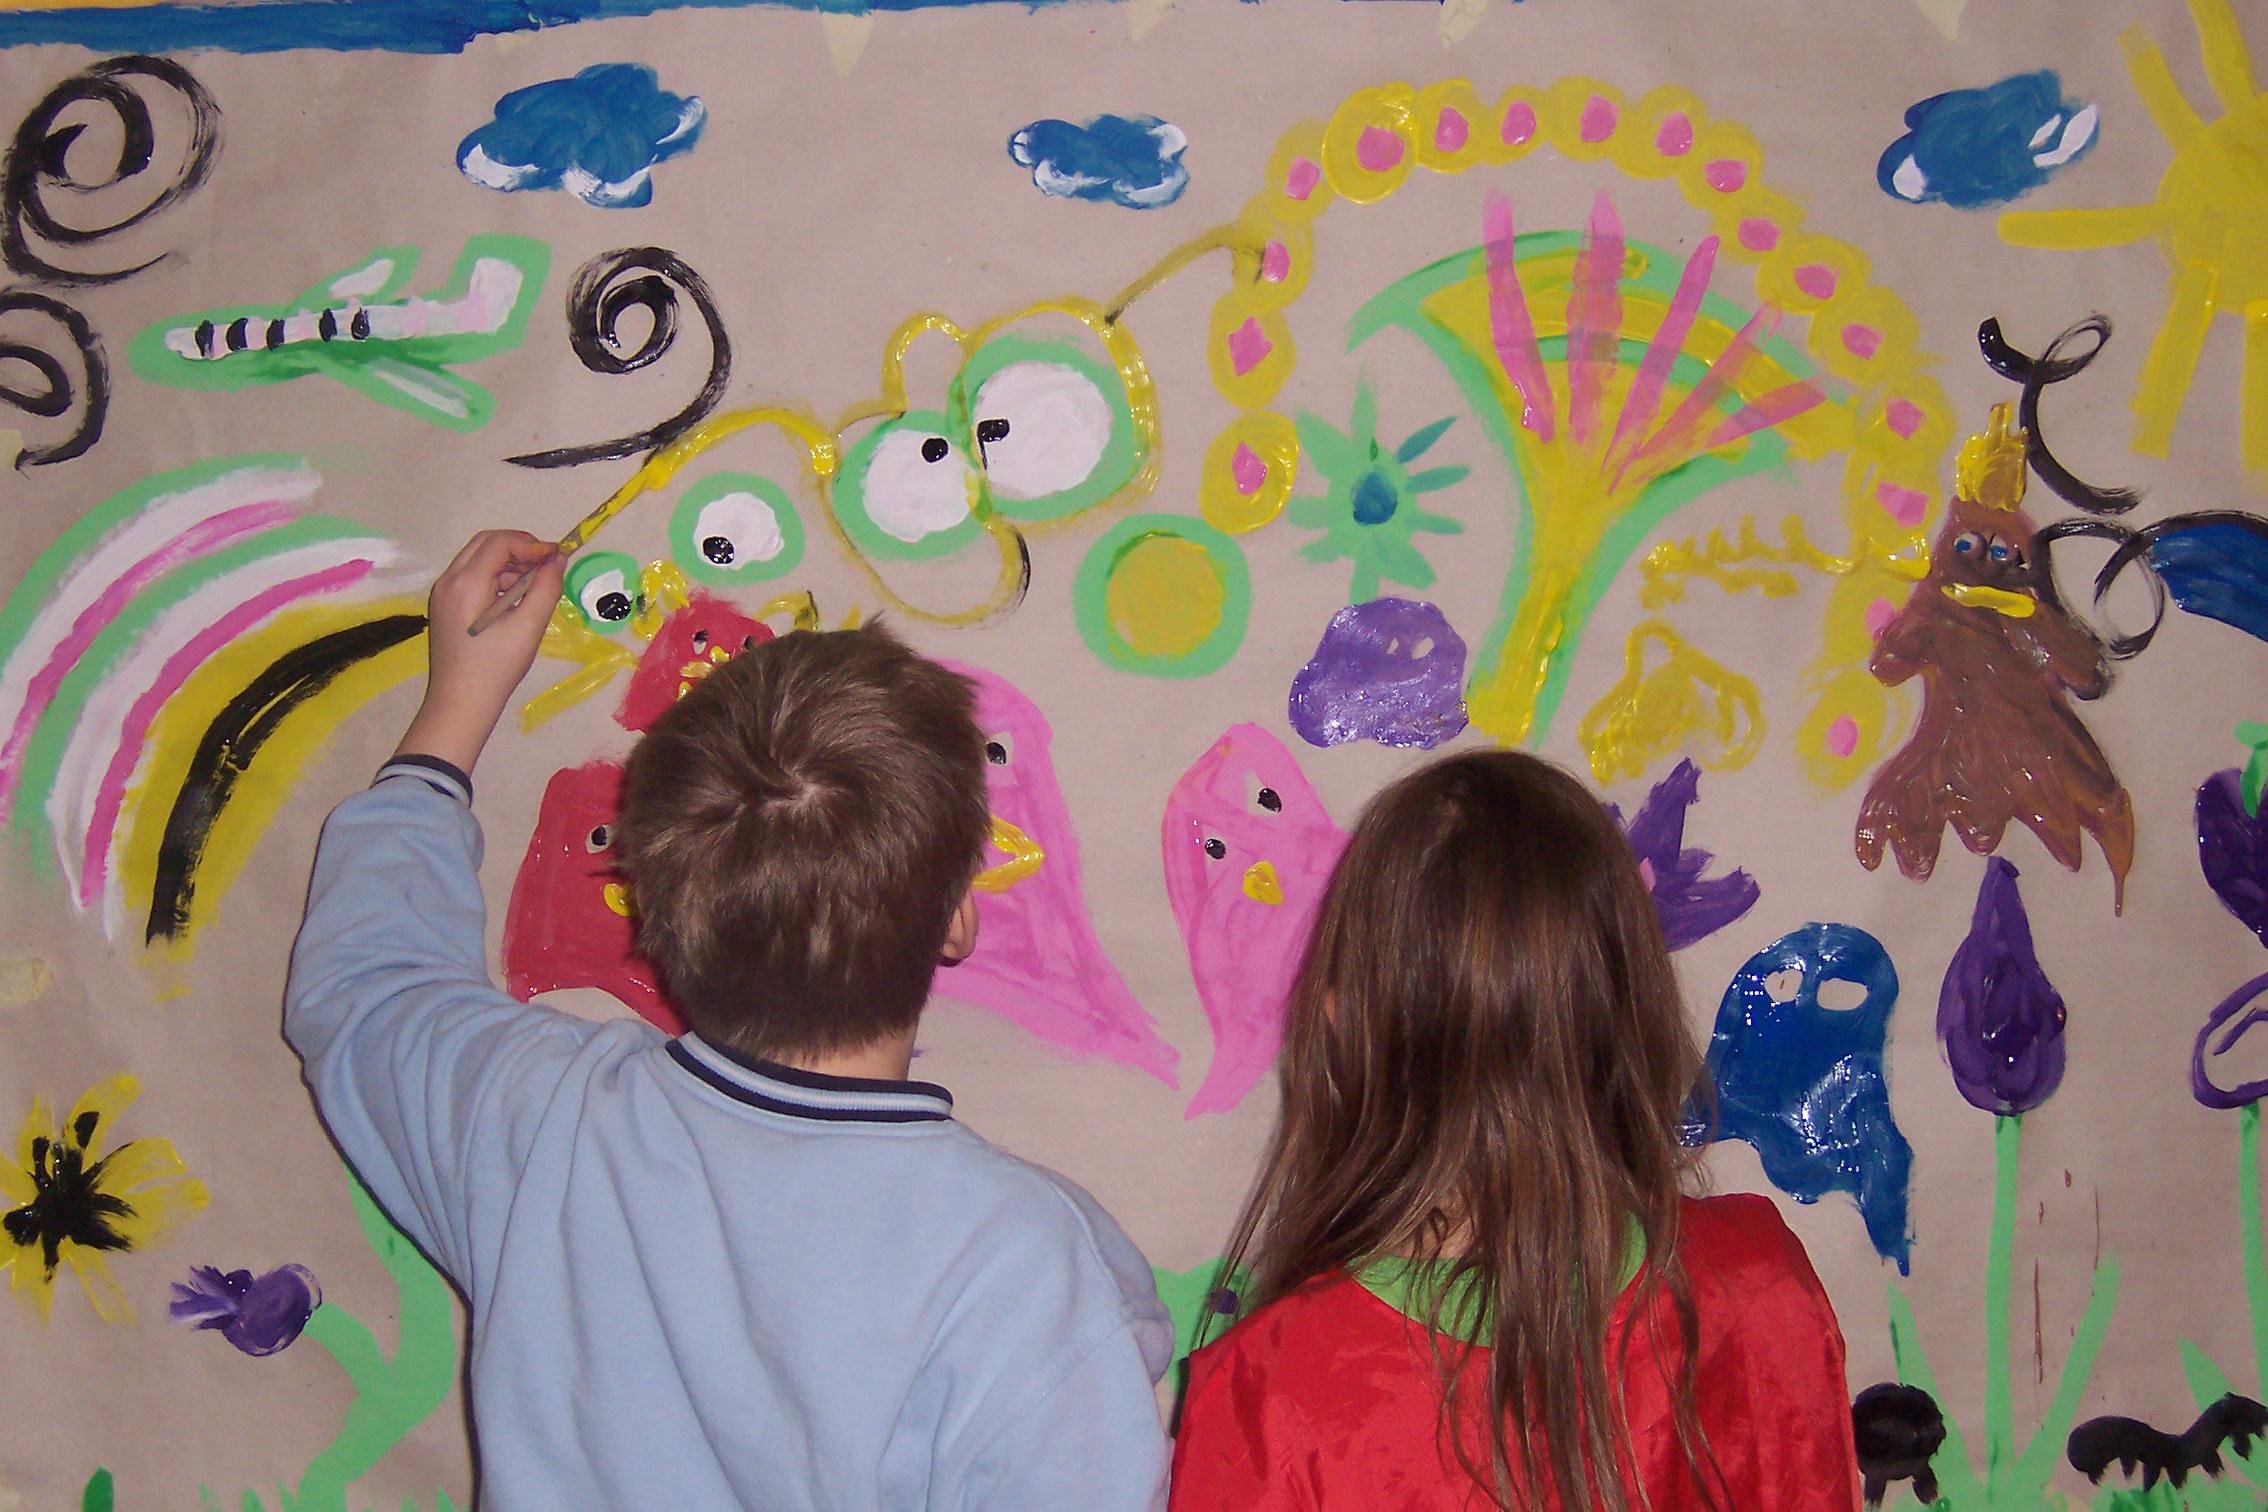 Malprojekte Mit Kindern Bunte Projekte